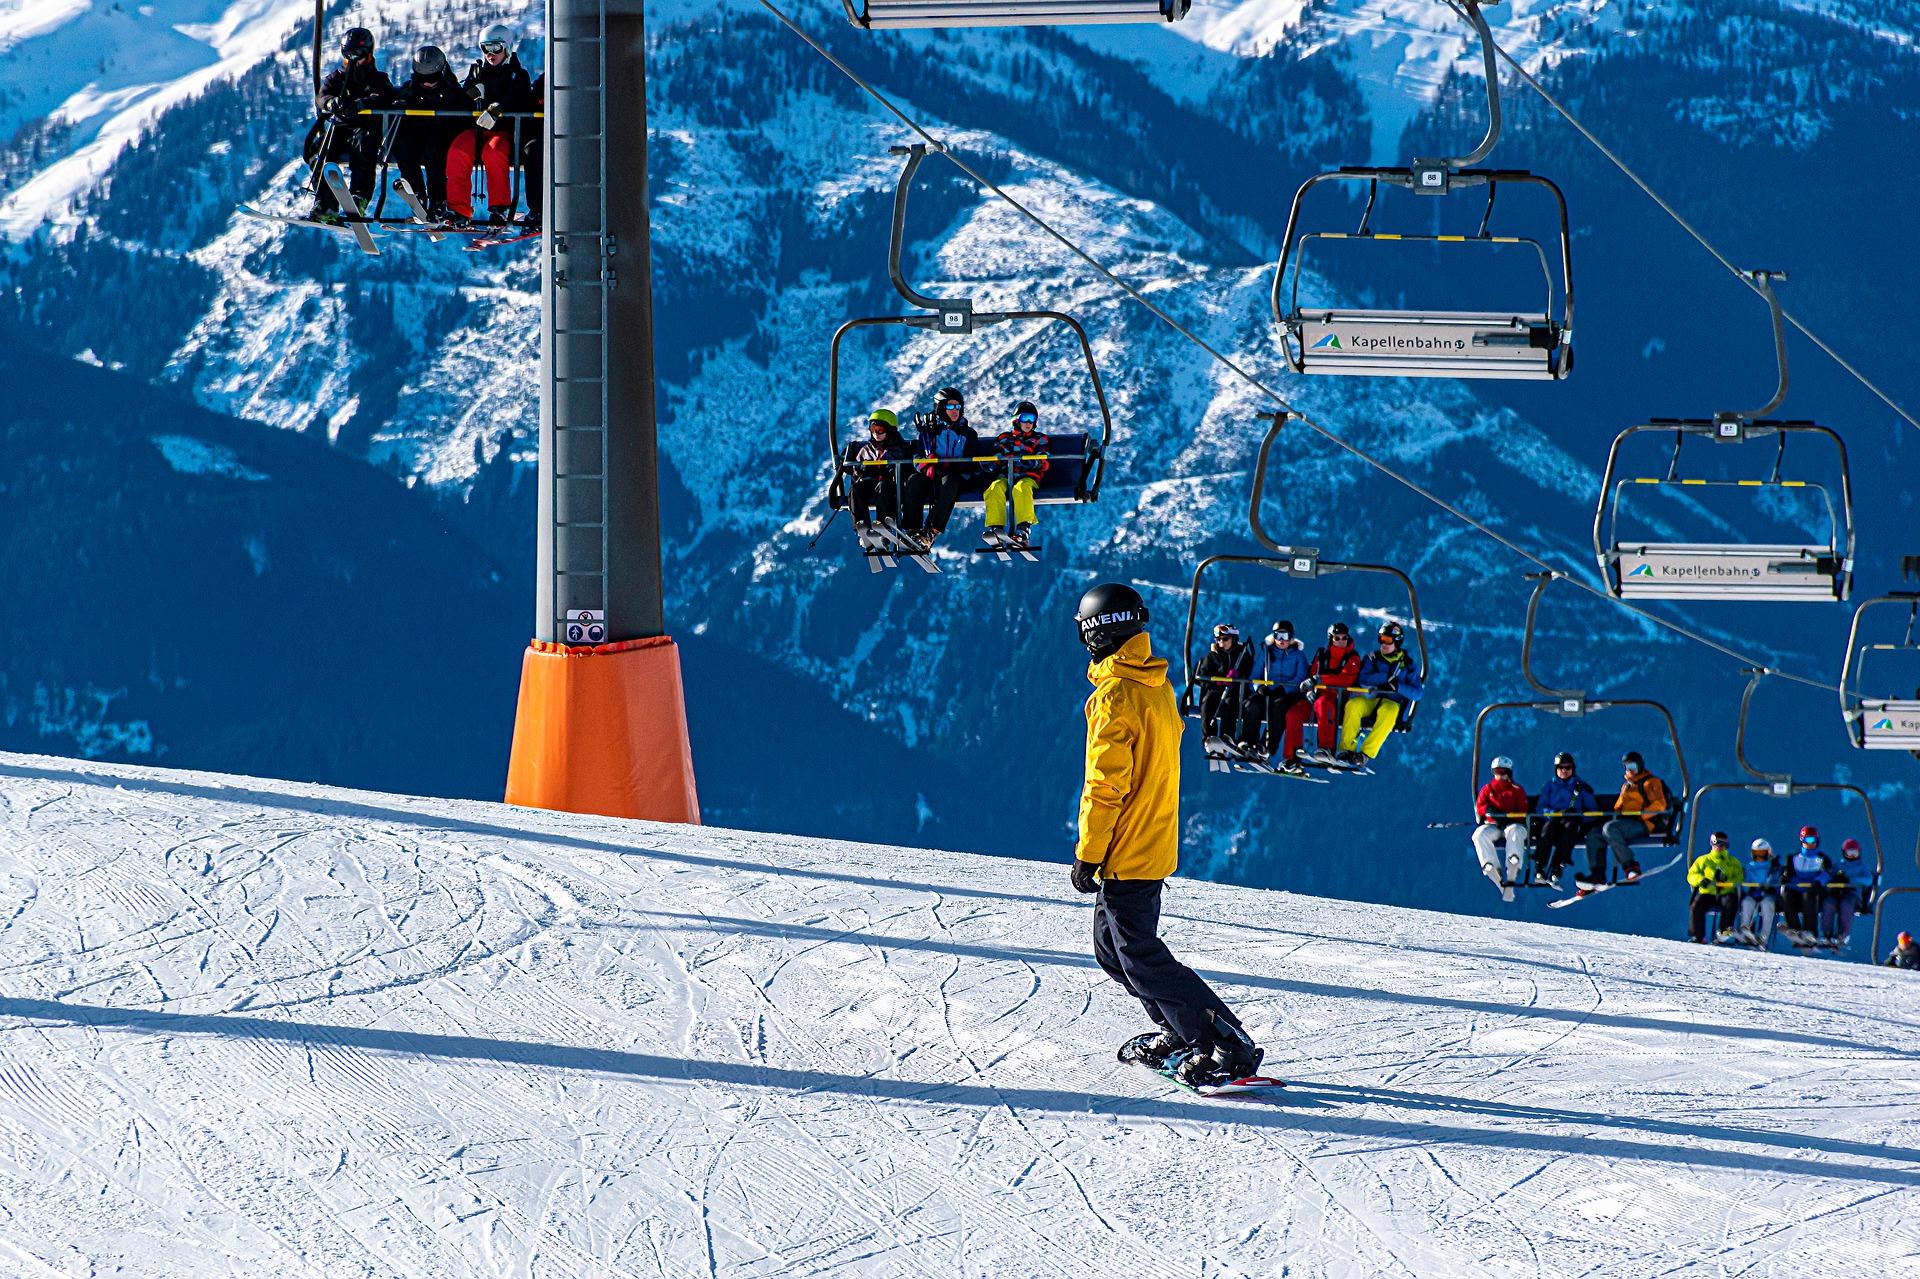 snowboarding winter sports pixabay